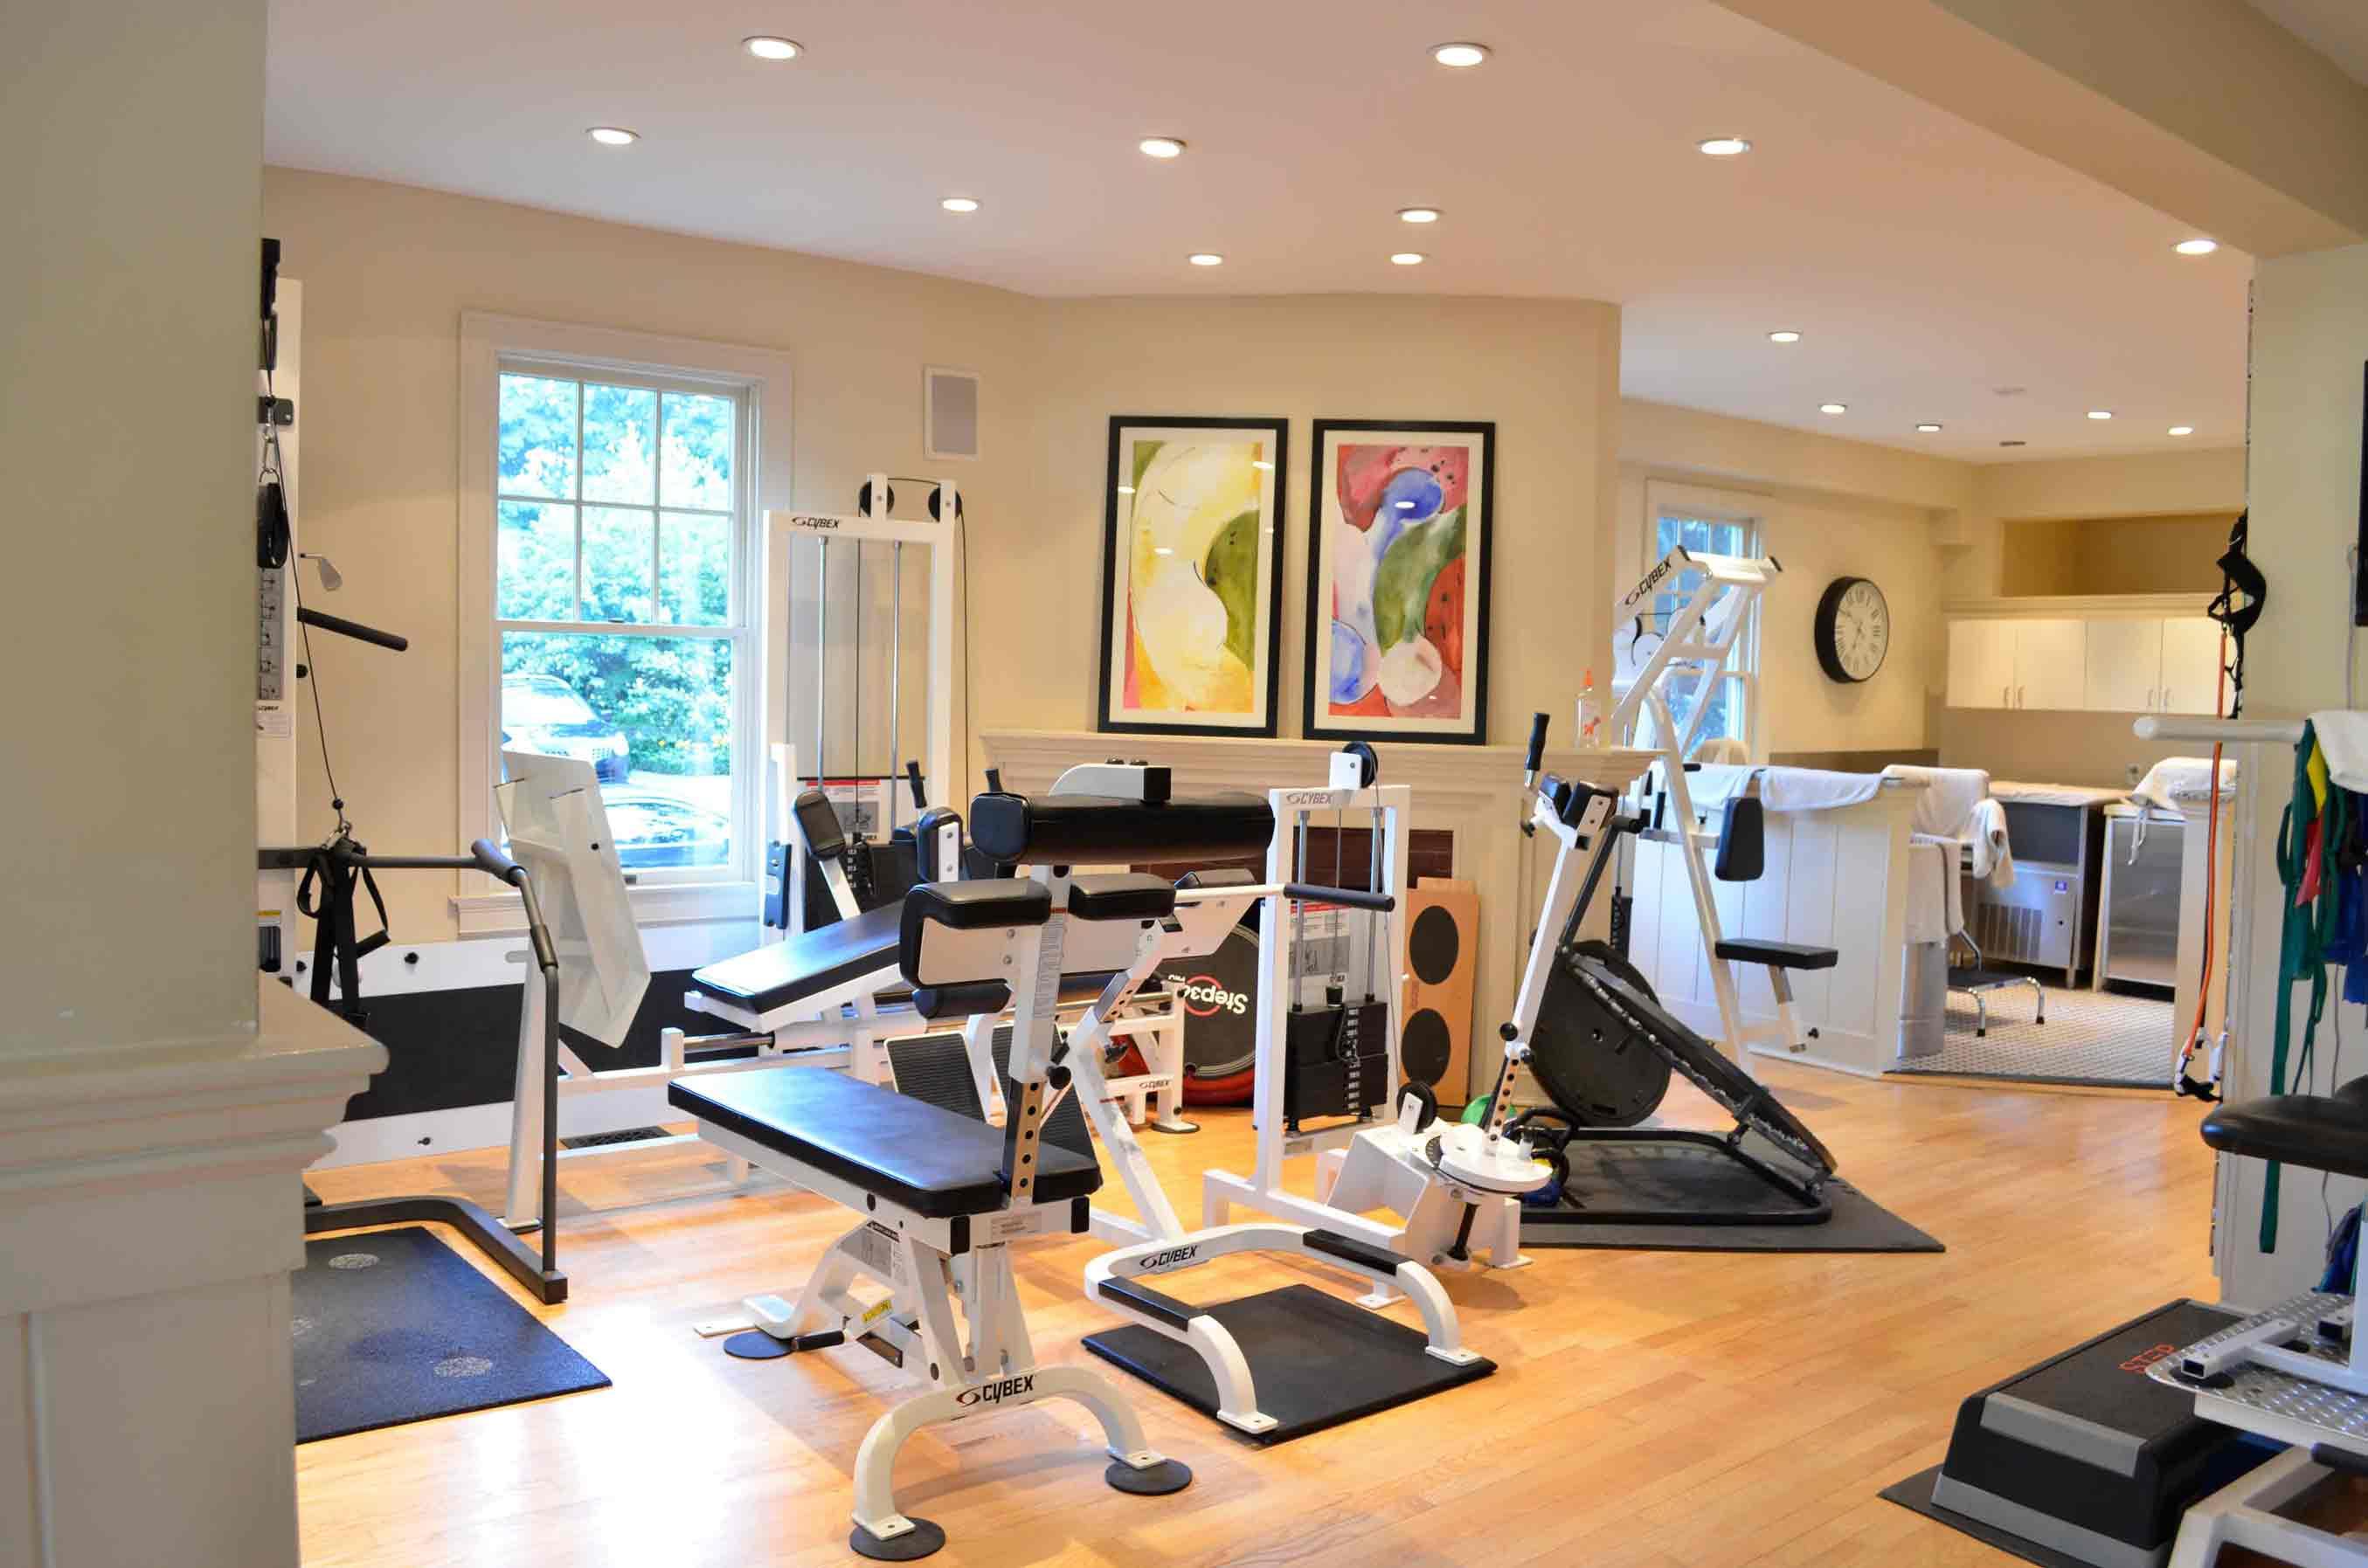 Huntington physical therapy - Prosports Of Huntington